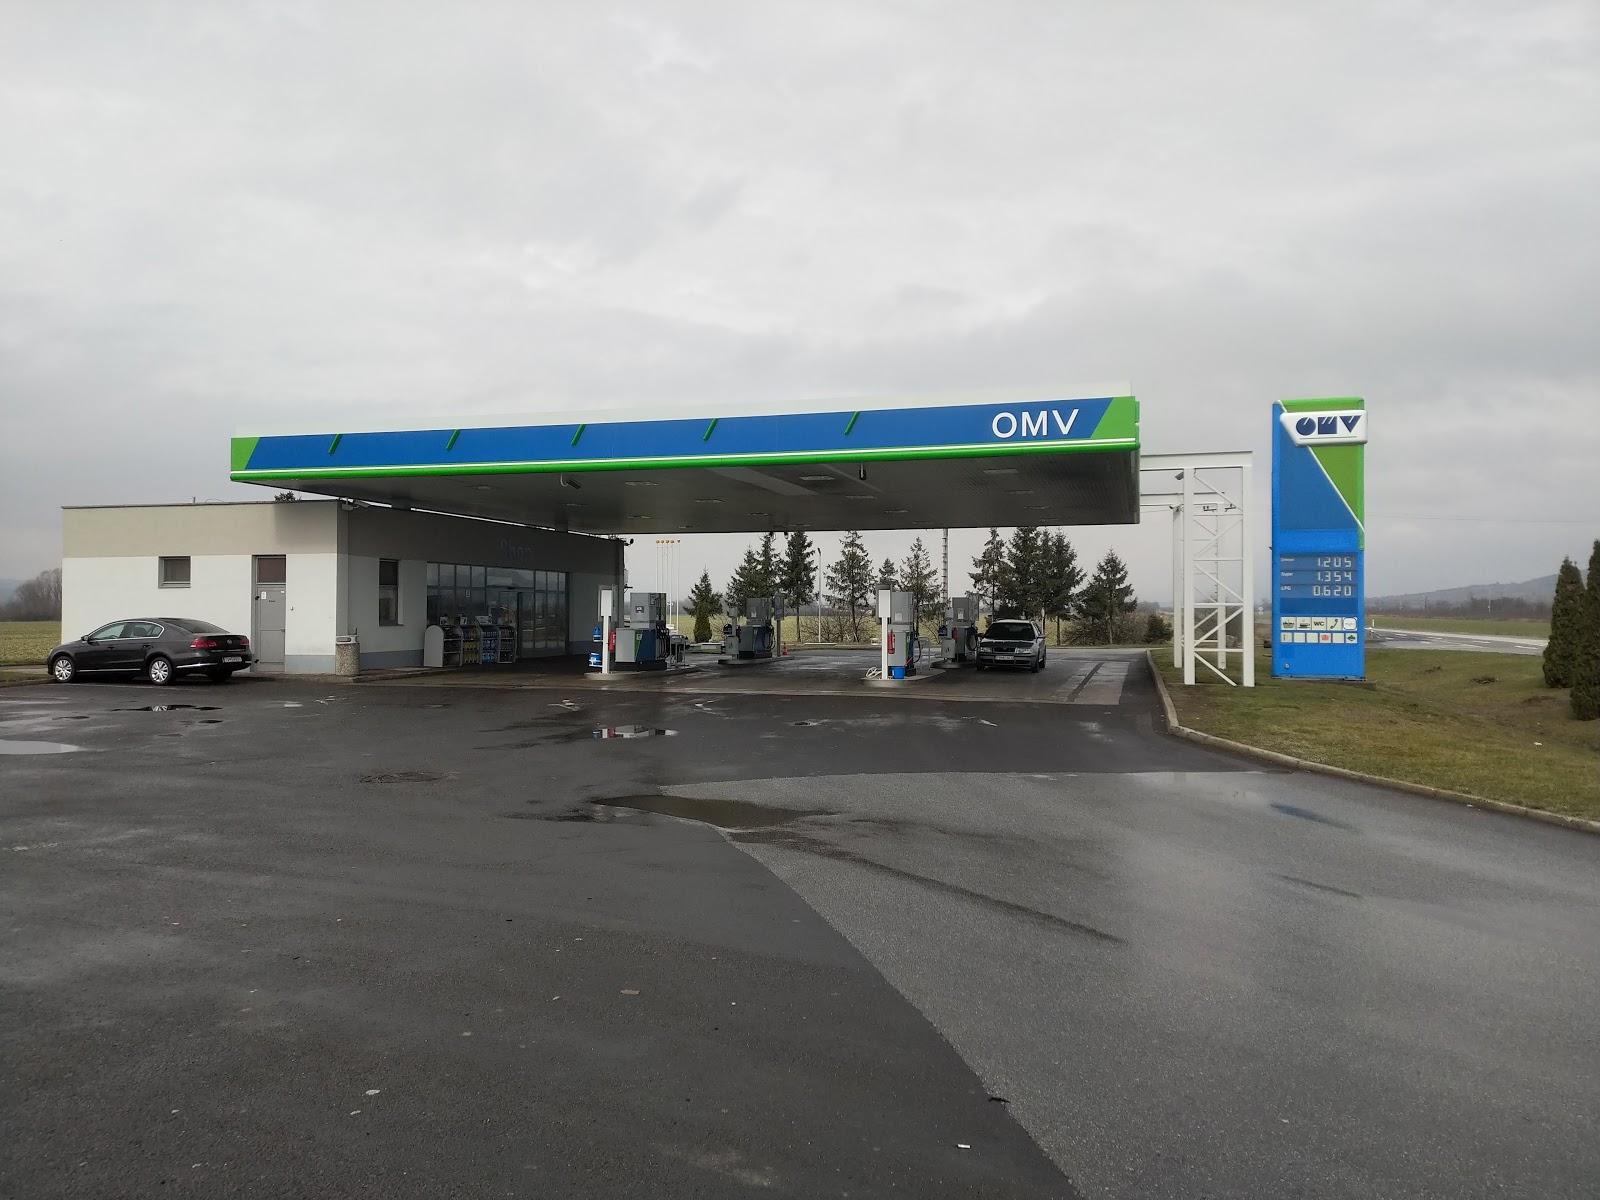 Petrol Station Omv Slovenske Nove Mesto Slovenske Nove Mesto